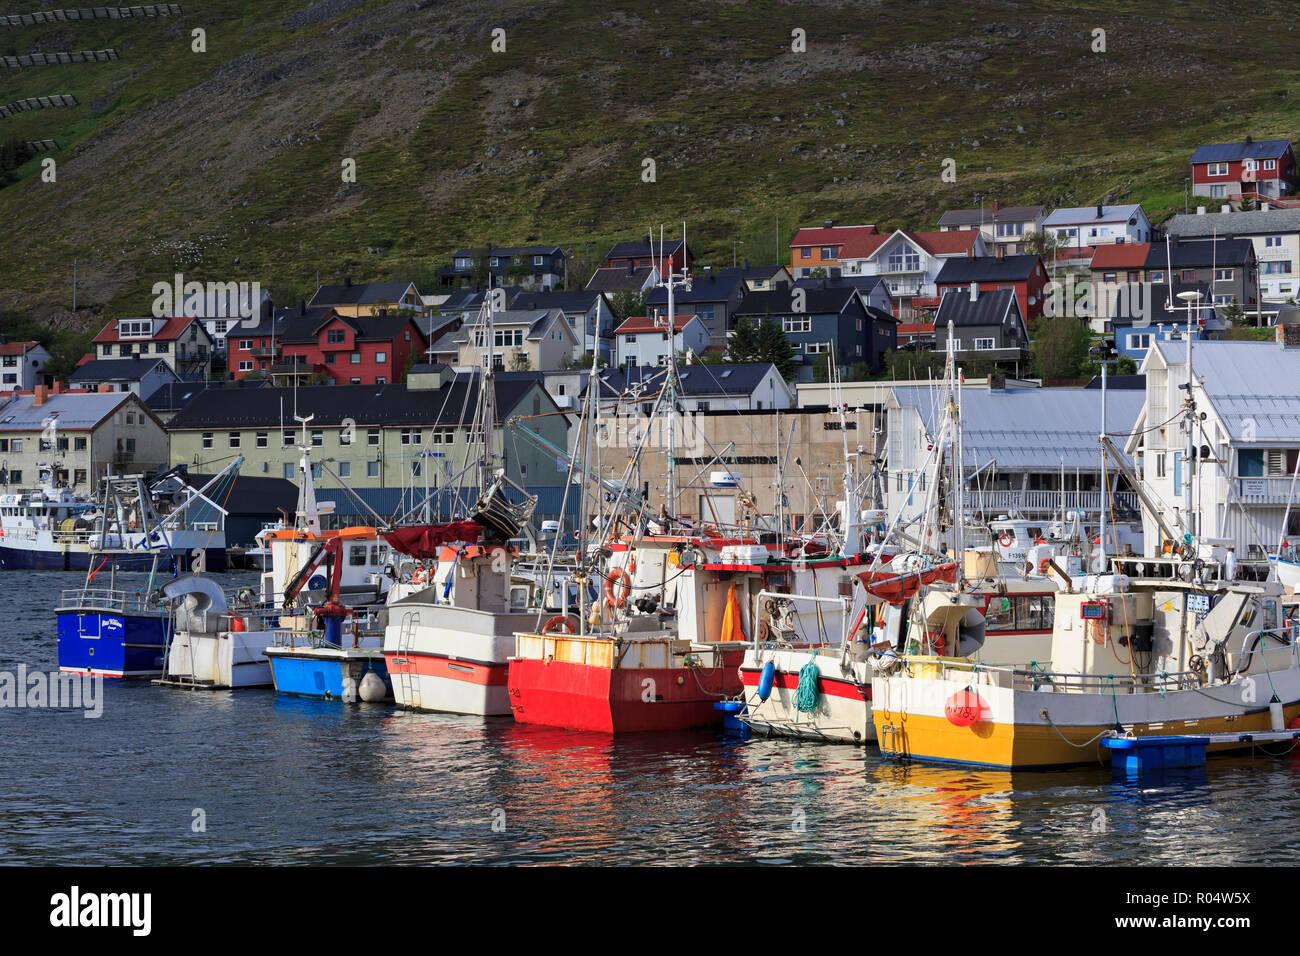 Fishing boats, Honningsvag Town, Mageroya Island, Finnmark County, Norway, Scandinavia, Europe - Stock Image